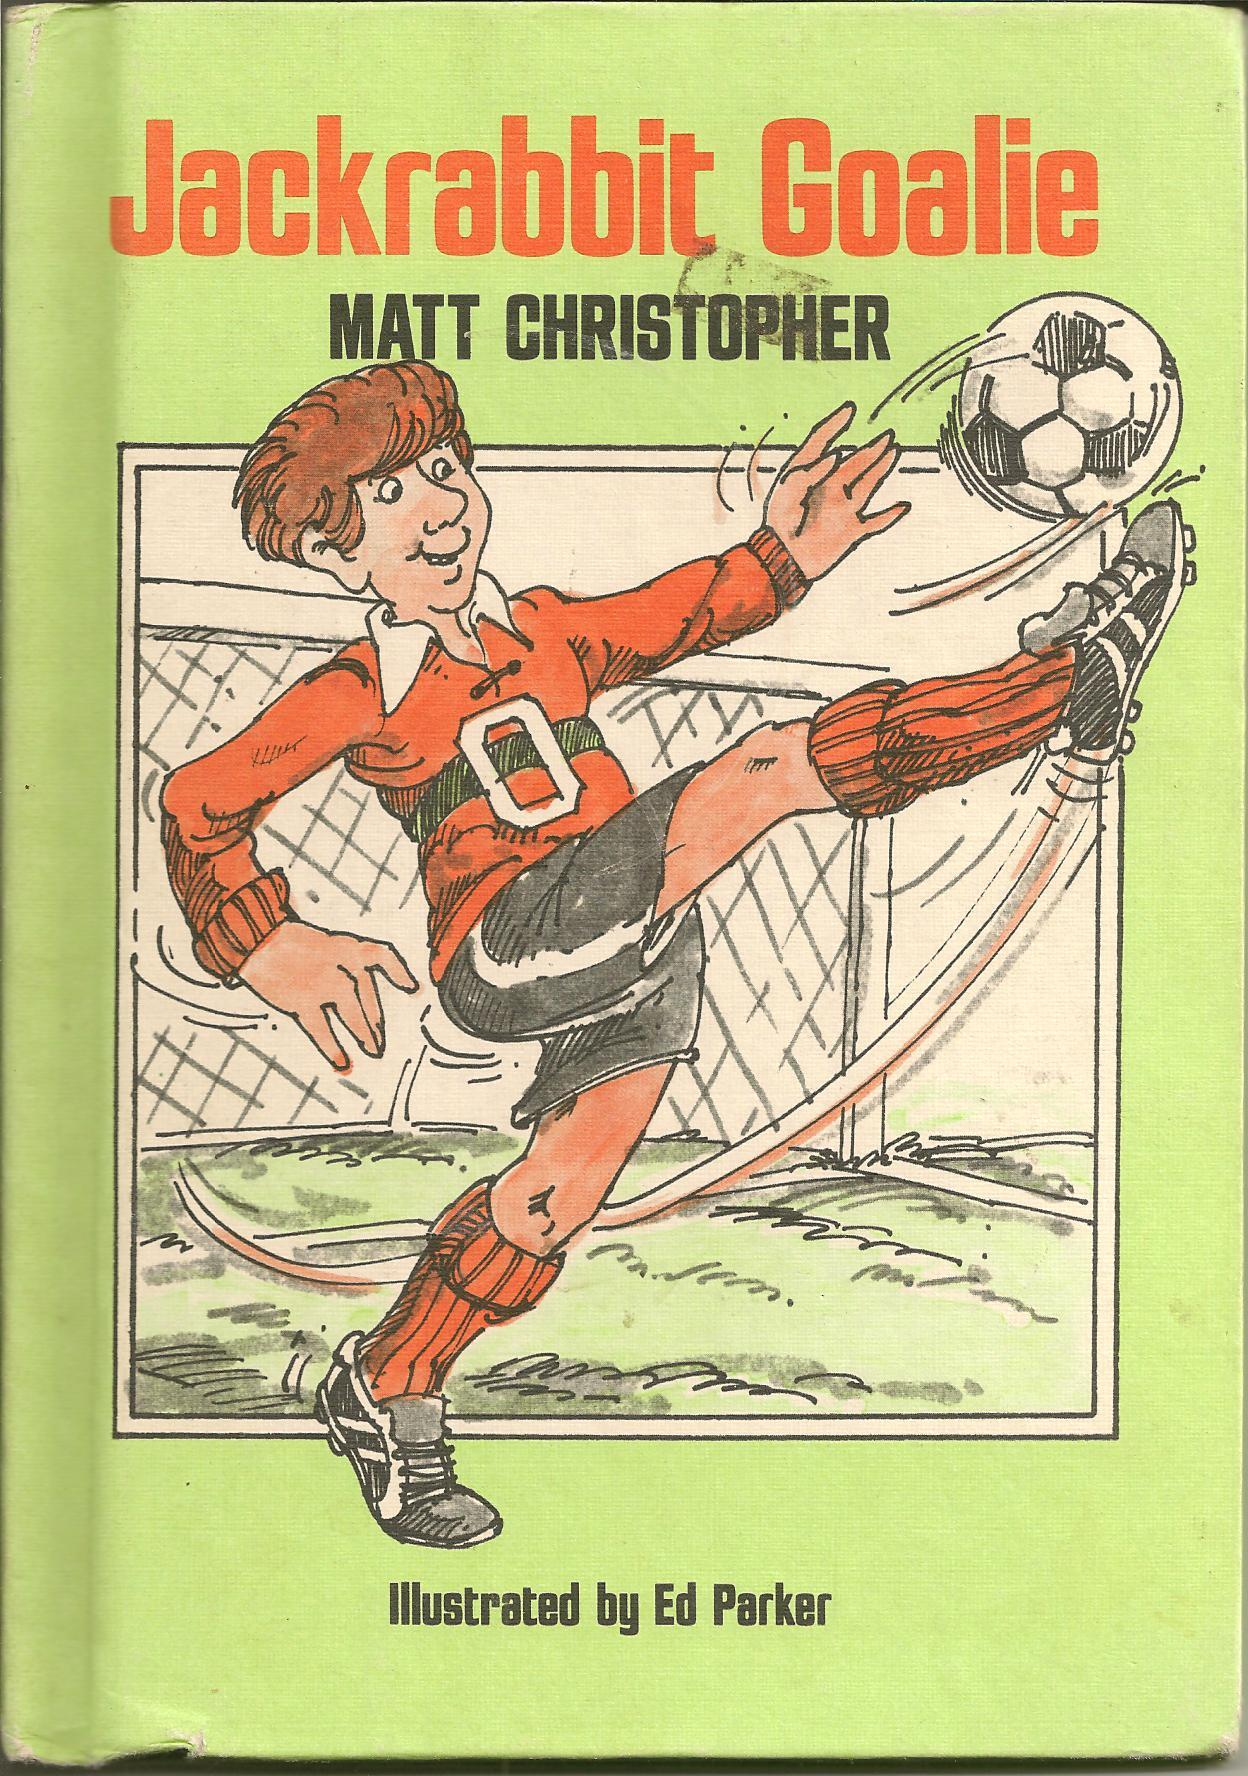 Jackrabbit Goalie (Weekly Reader Books) Matt Christopher